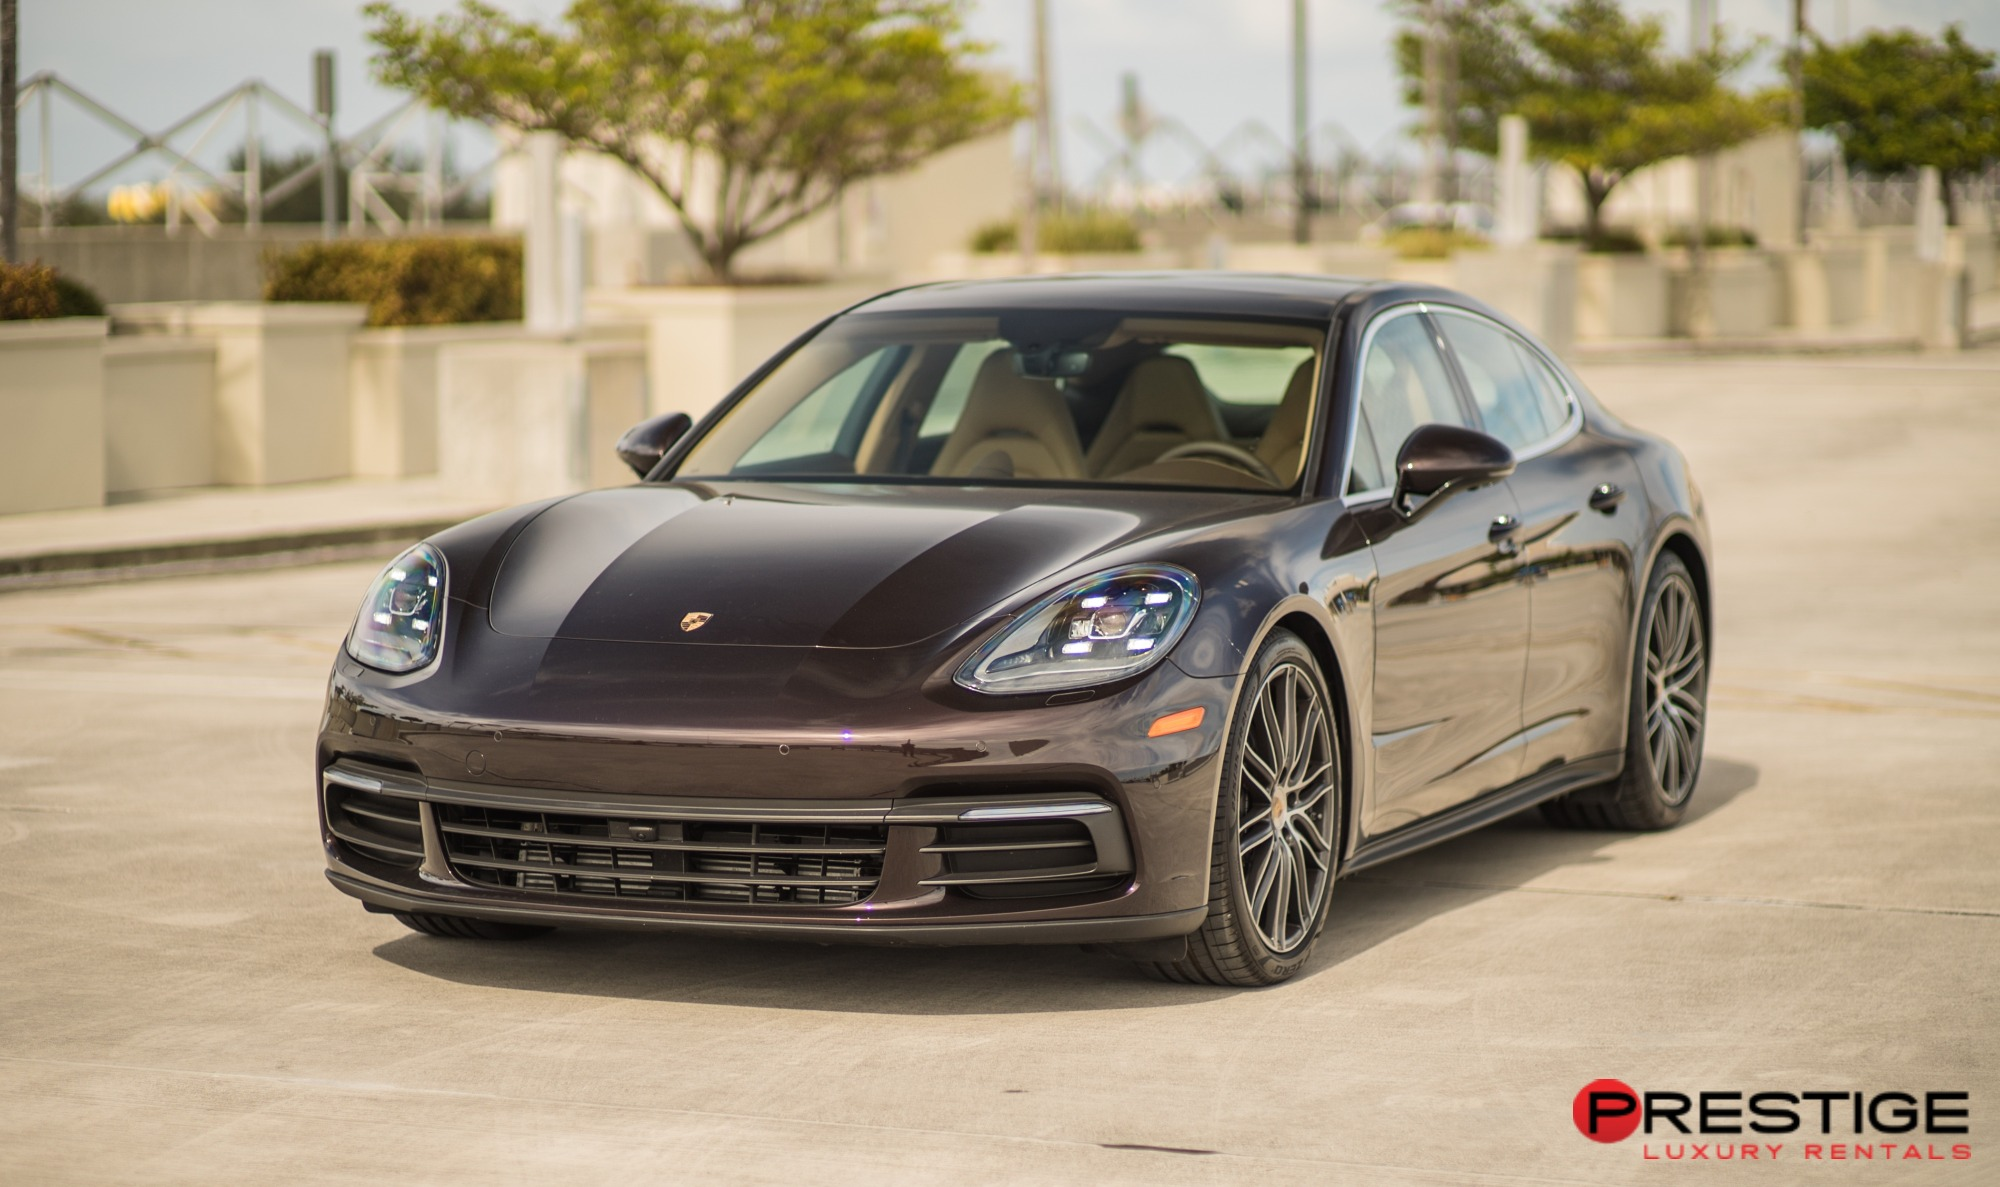 Car Rental Columbus Ga >> Porsche Panamera 4S Rent in Atlanta, Georgia